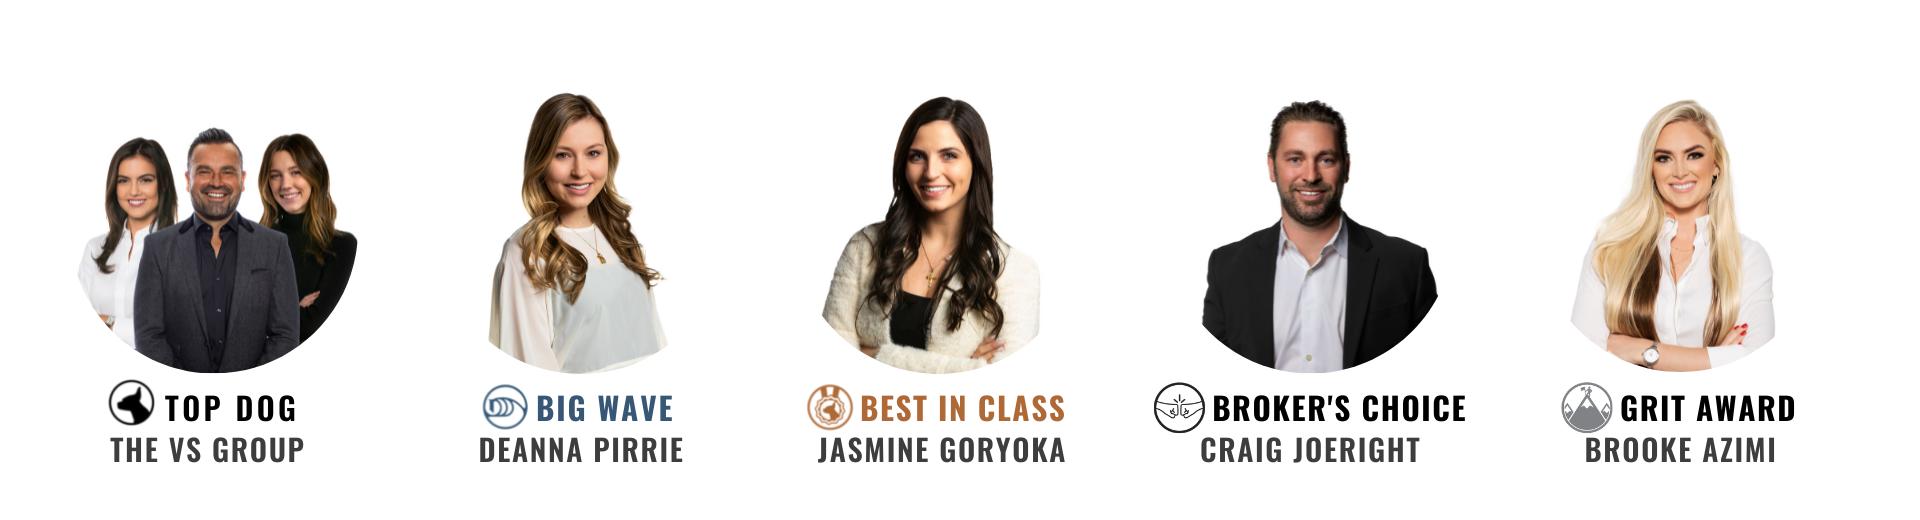 Blog Header - Brokerage Award Winners (3)